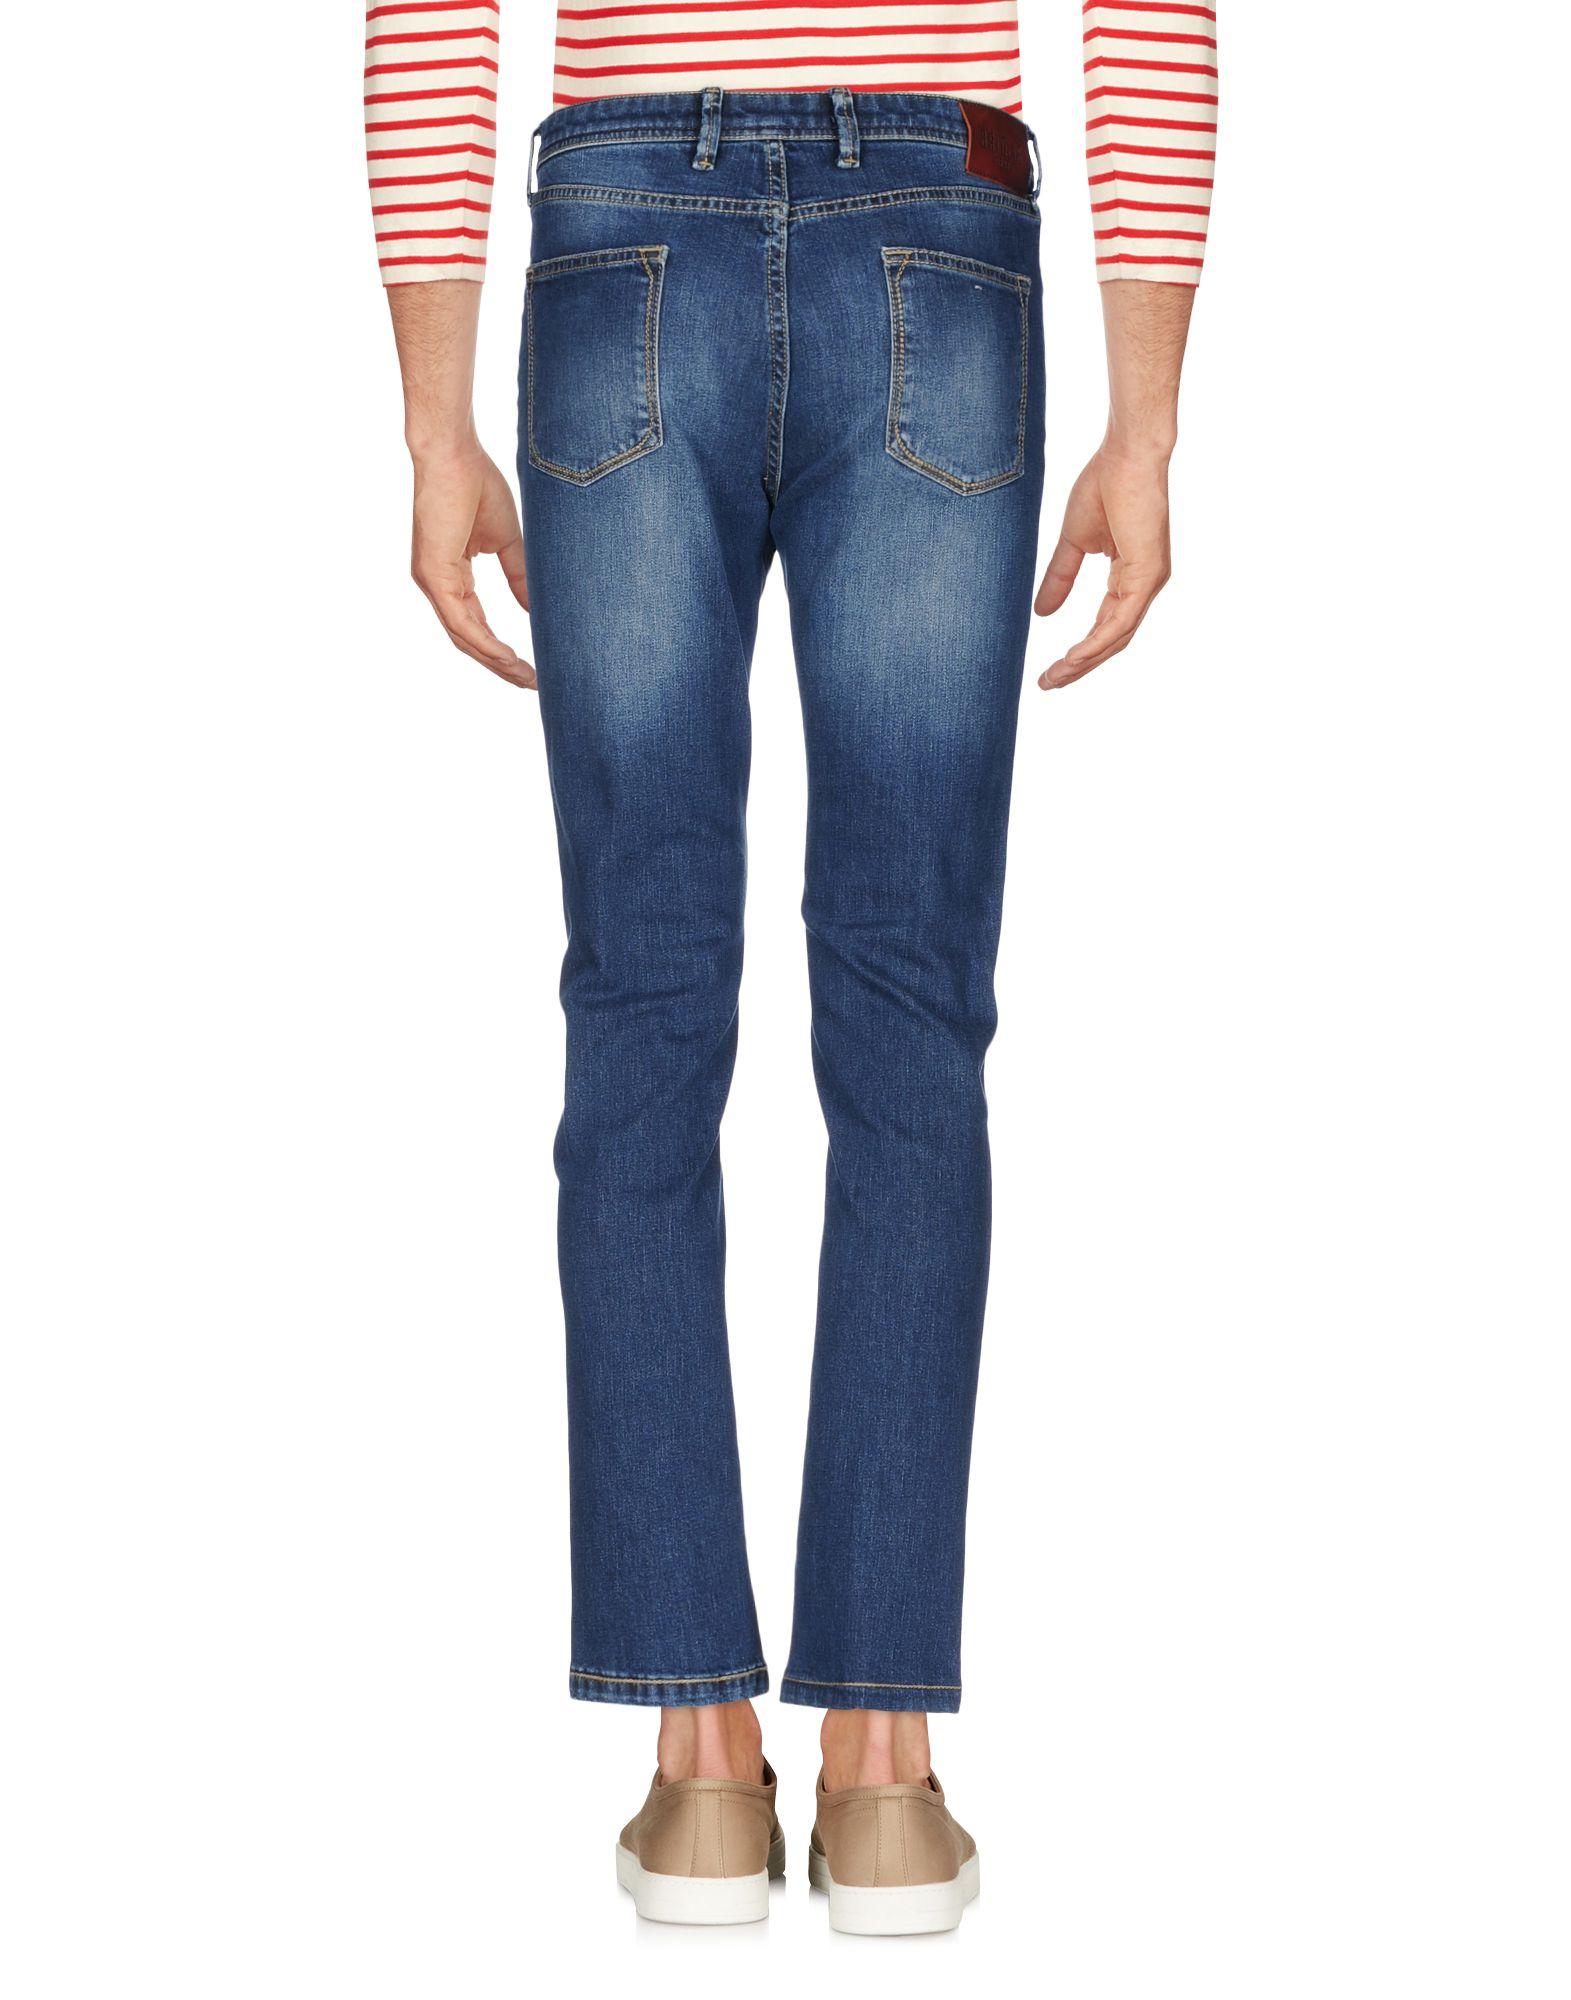 Pantaloni Jeans Briglia 1949 1949 Briglia Uomo - 42638443OH eafc1c